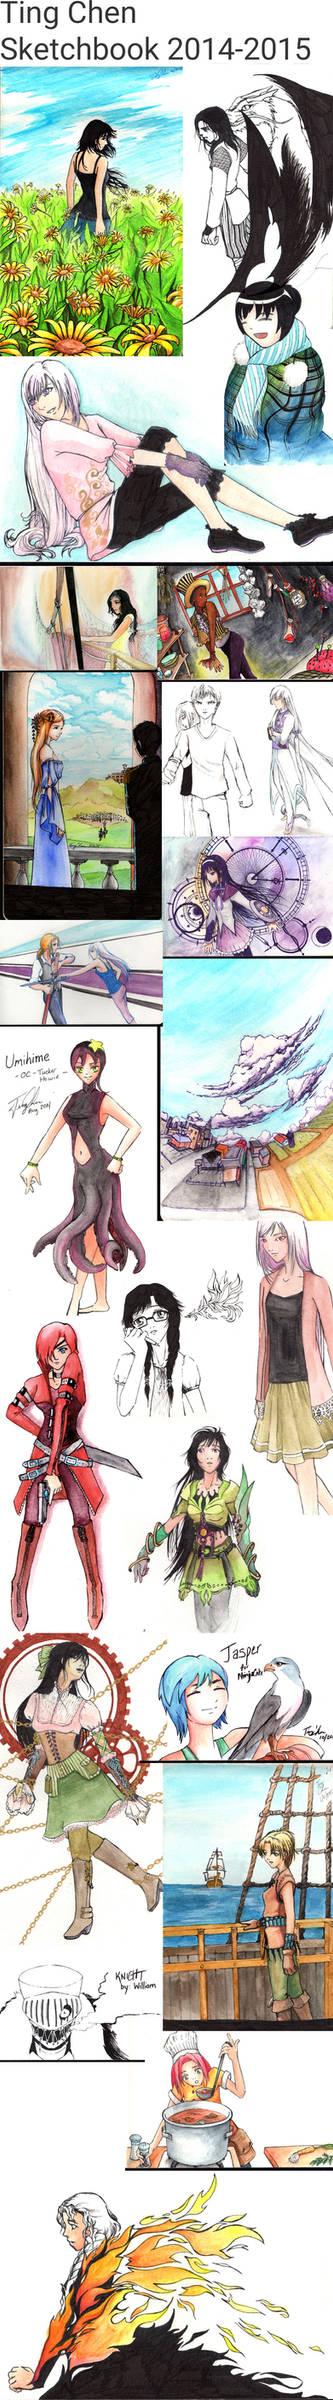 Sketchdump 2014-2015